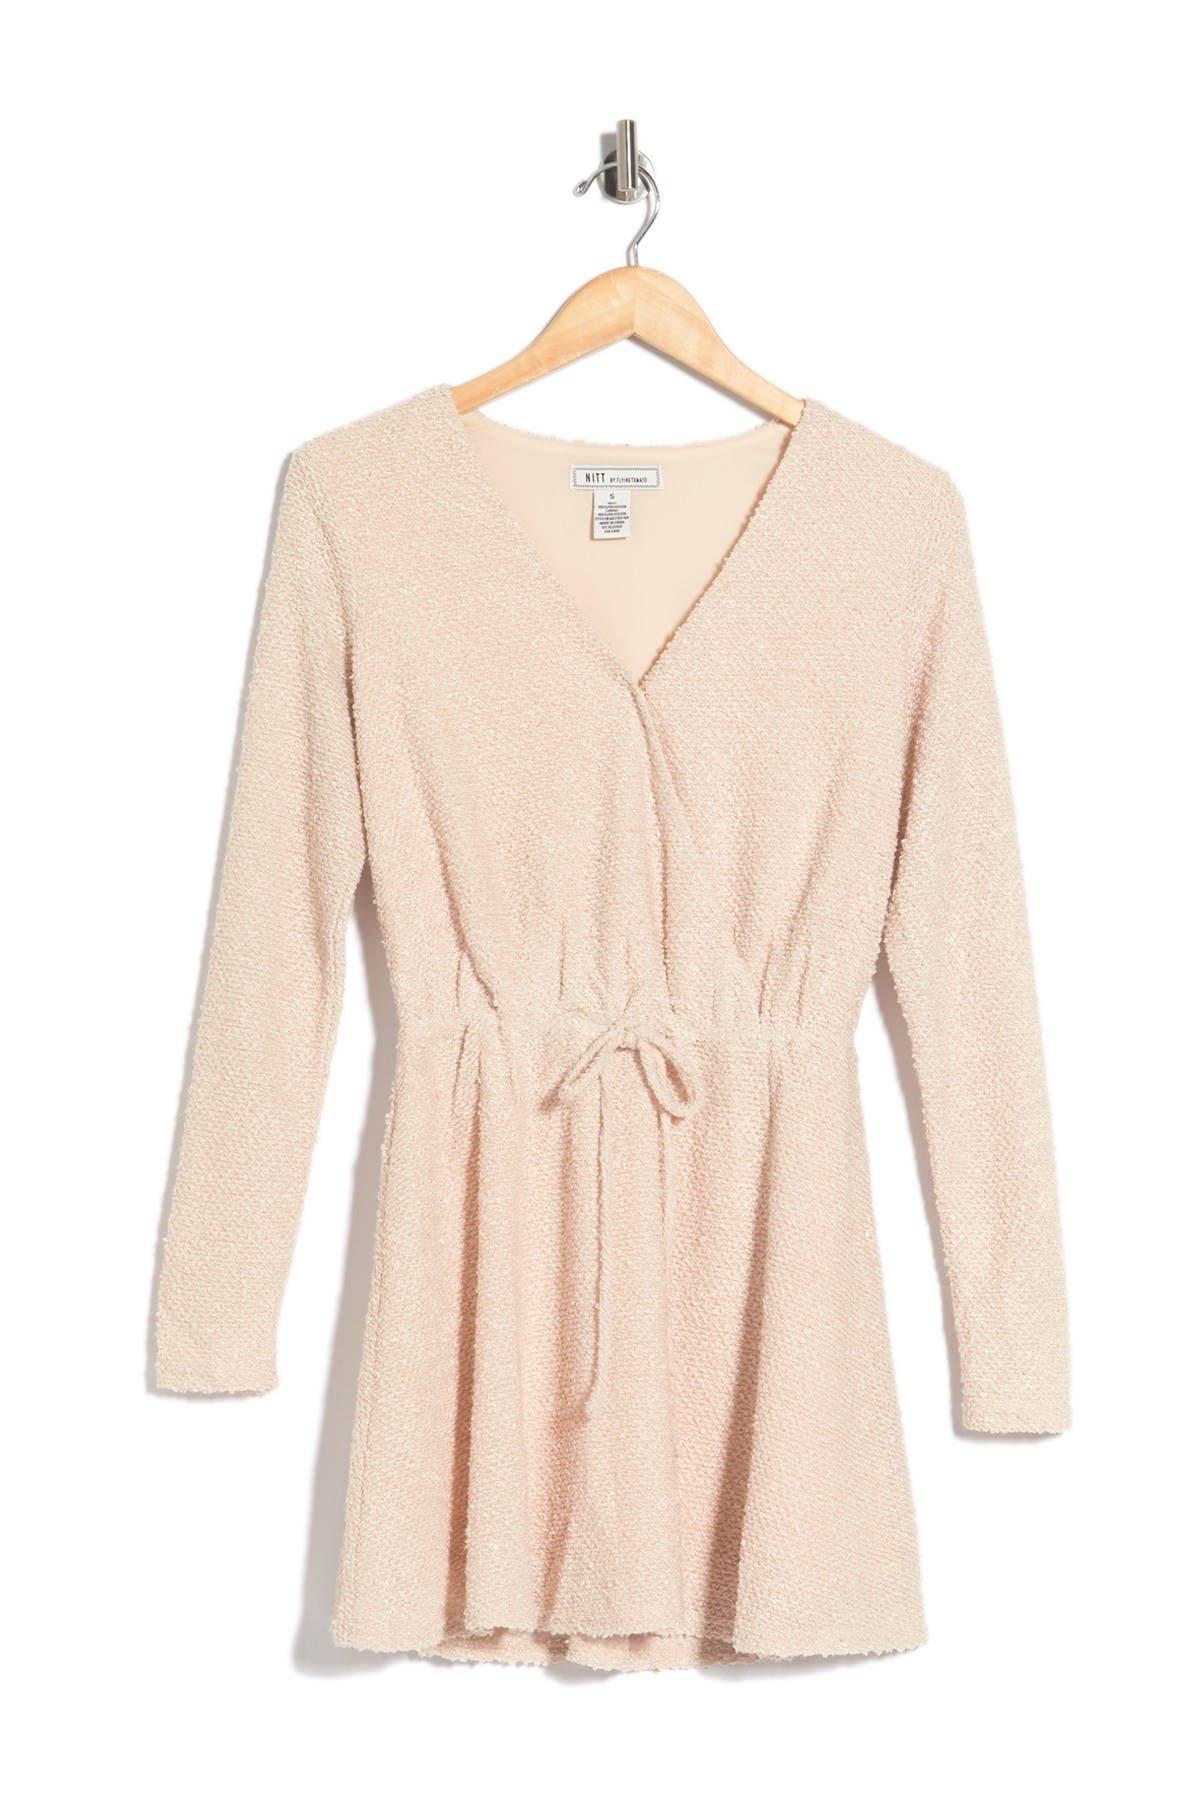 Image of A.Calin Textured Knit Long Sleeve Mini Dress